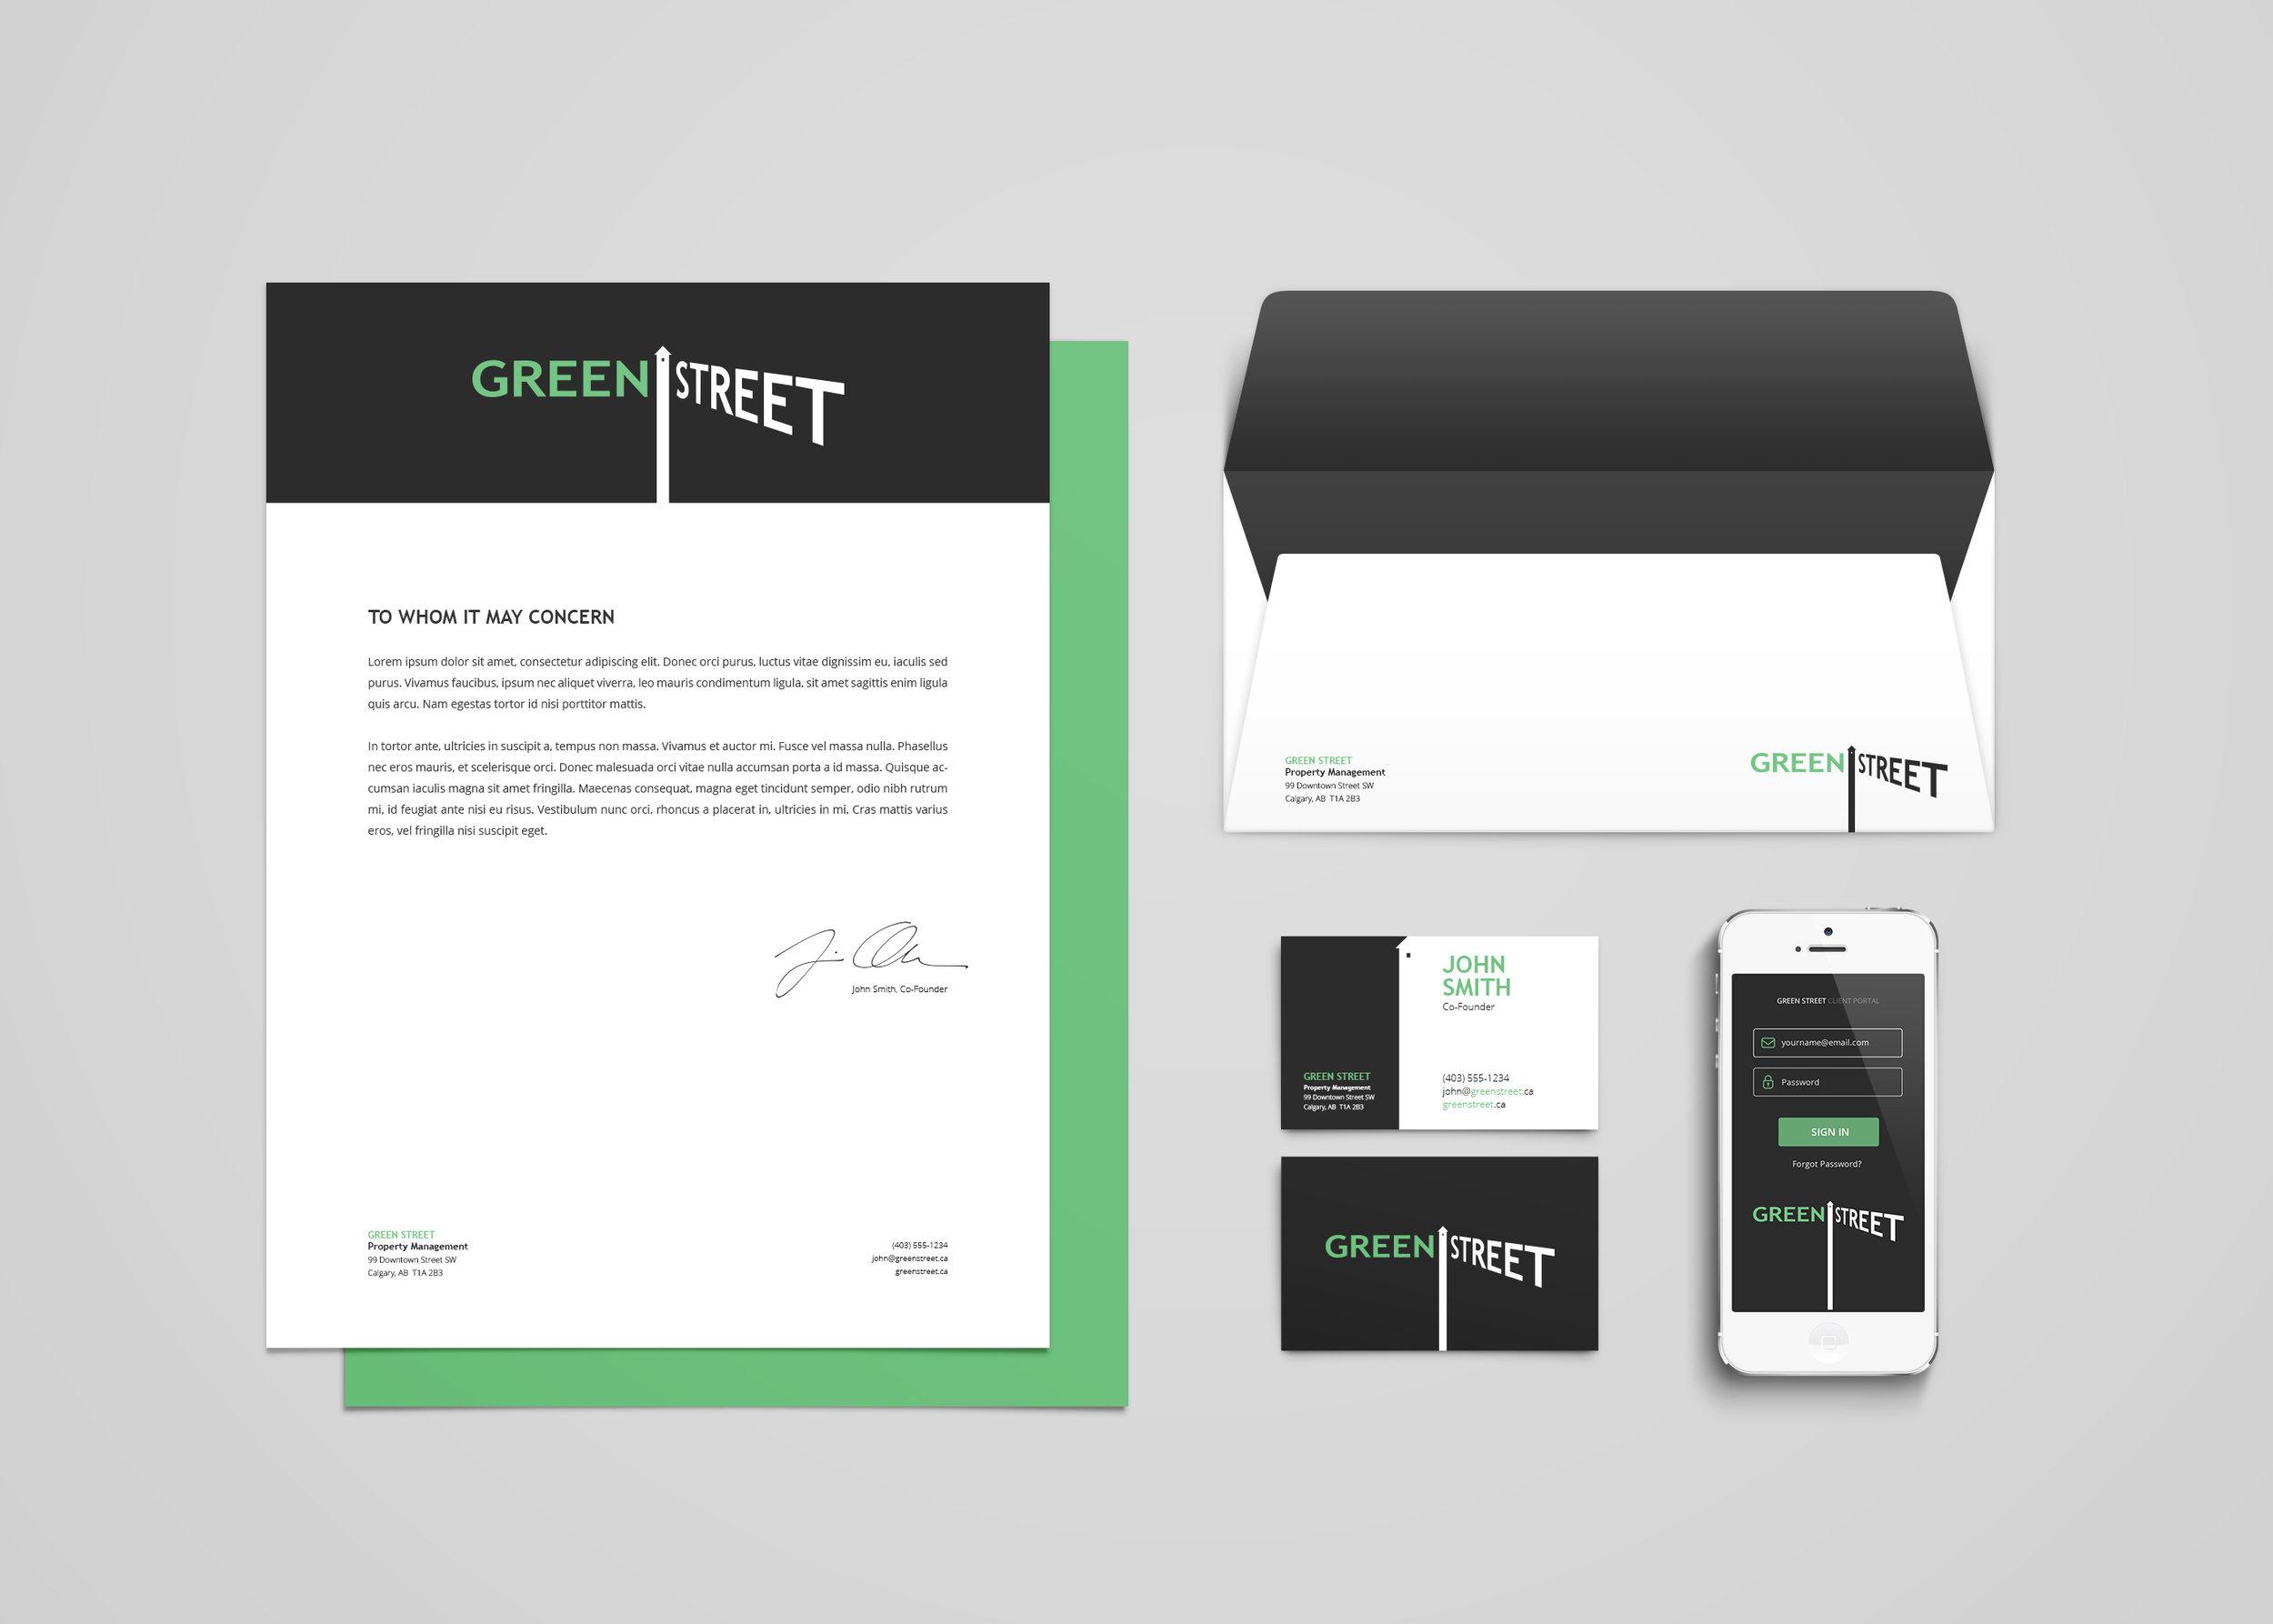 greenstreet_brand_mockup.jpg